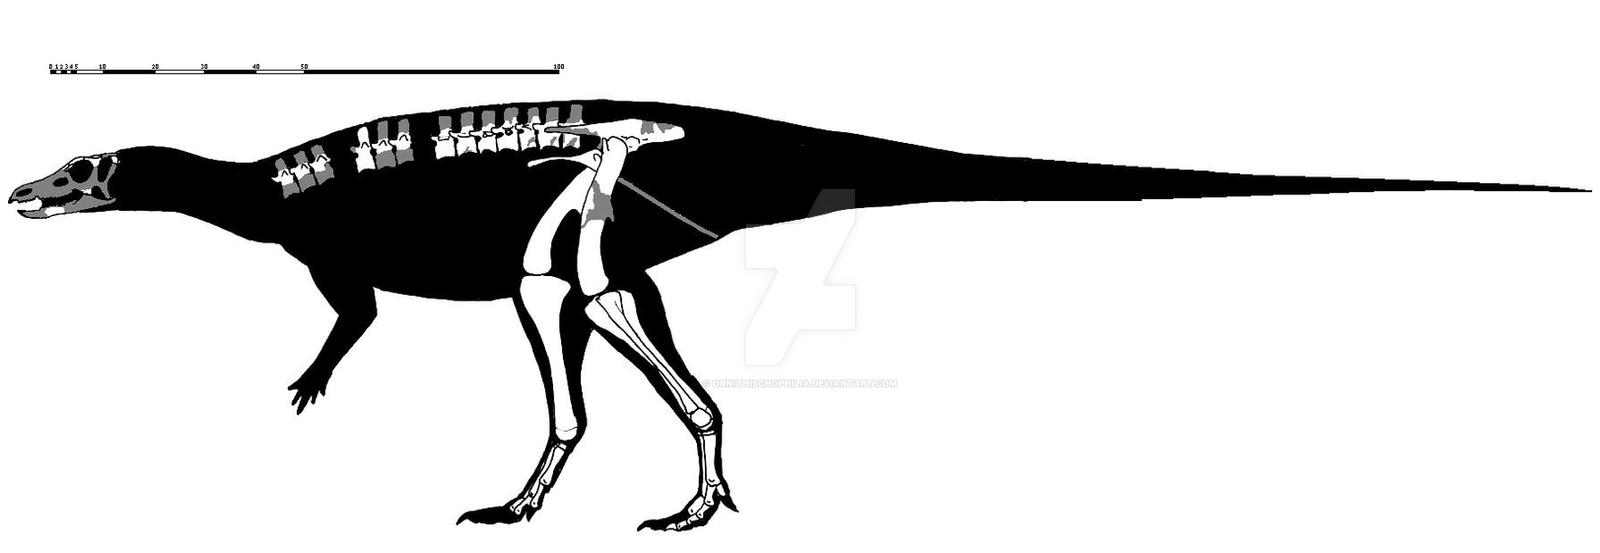 Thescelosaurus assiniboiensis skeletal reconstruct